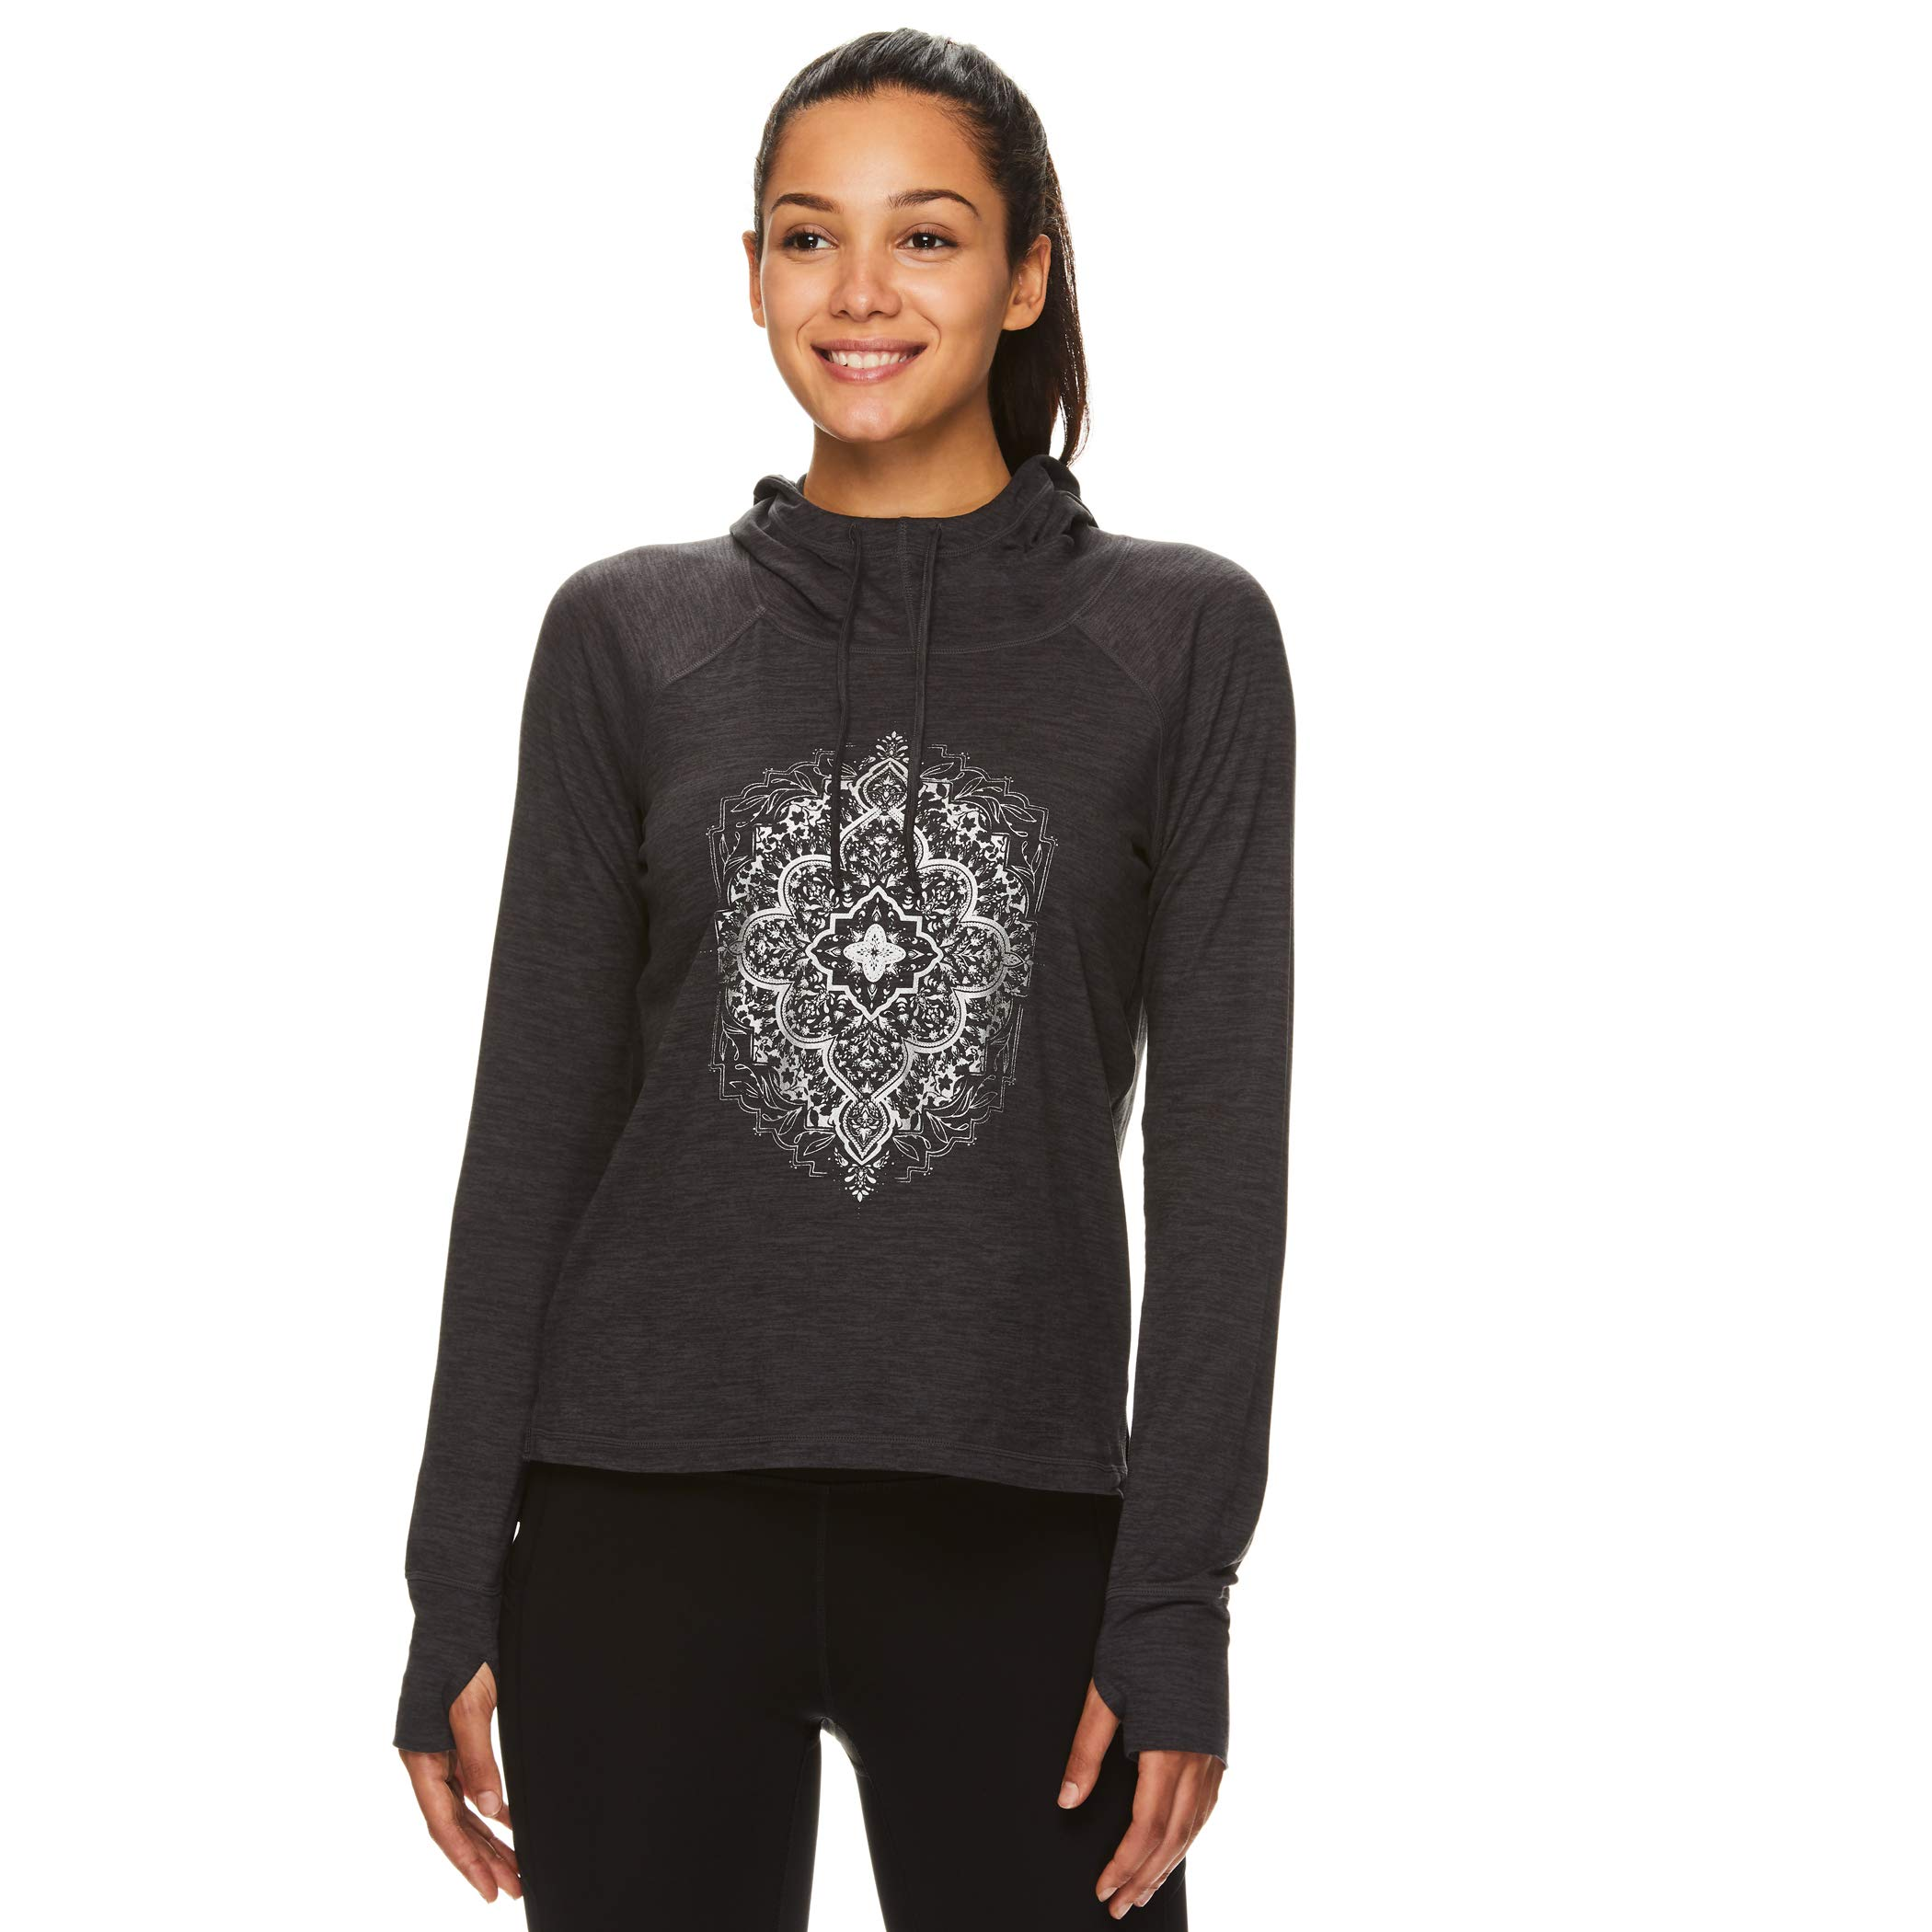 Gaiam Women's Pullover Hoodie Yoga Sweatshirt - Lightweight Long Sleeve Athleisure Sweater - Maya Gaiam Asphalt Grey Heather, Large by Gaiam